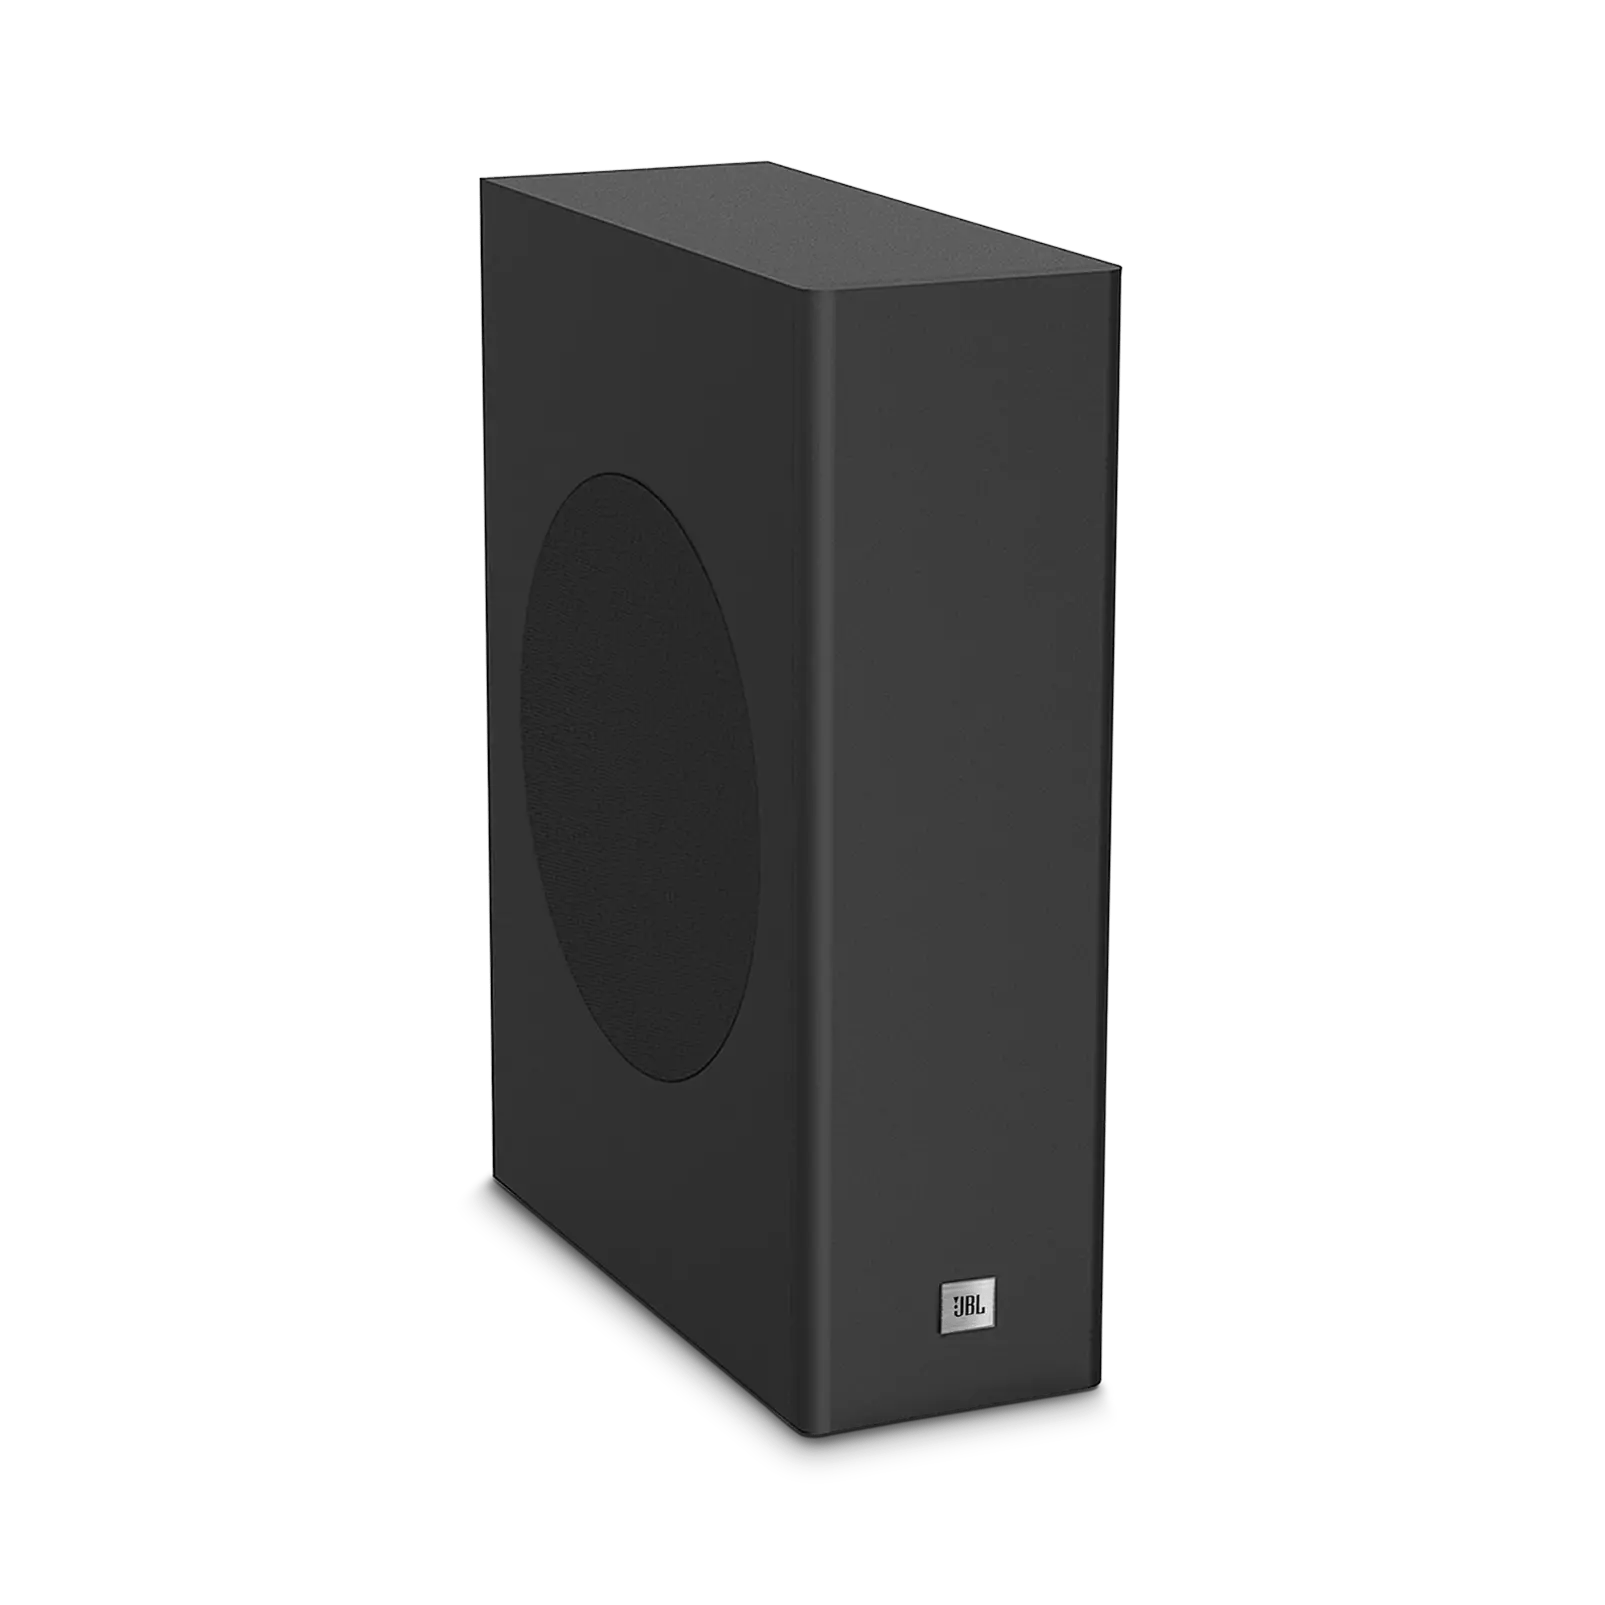 hight resolution of cinema sb150 compact 150w home cinema soundbar with wireless cinema sb150 jbl home audio wiring diagram